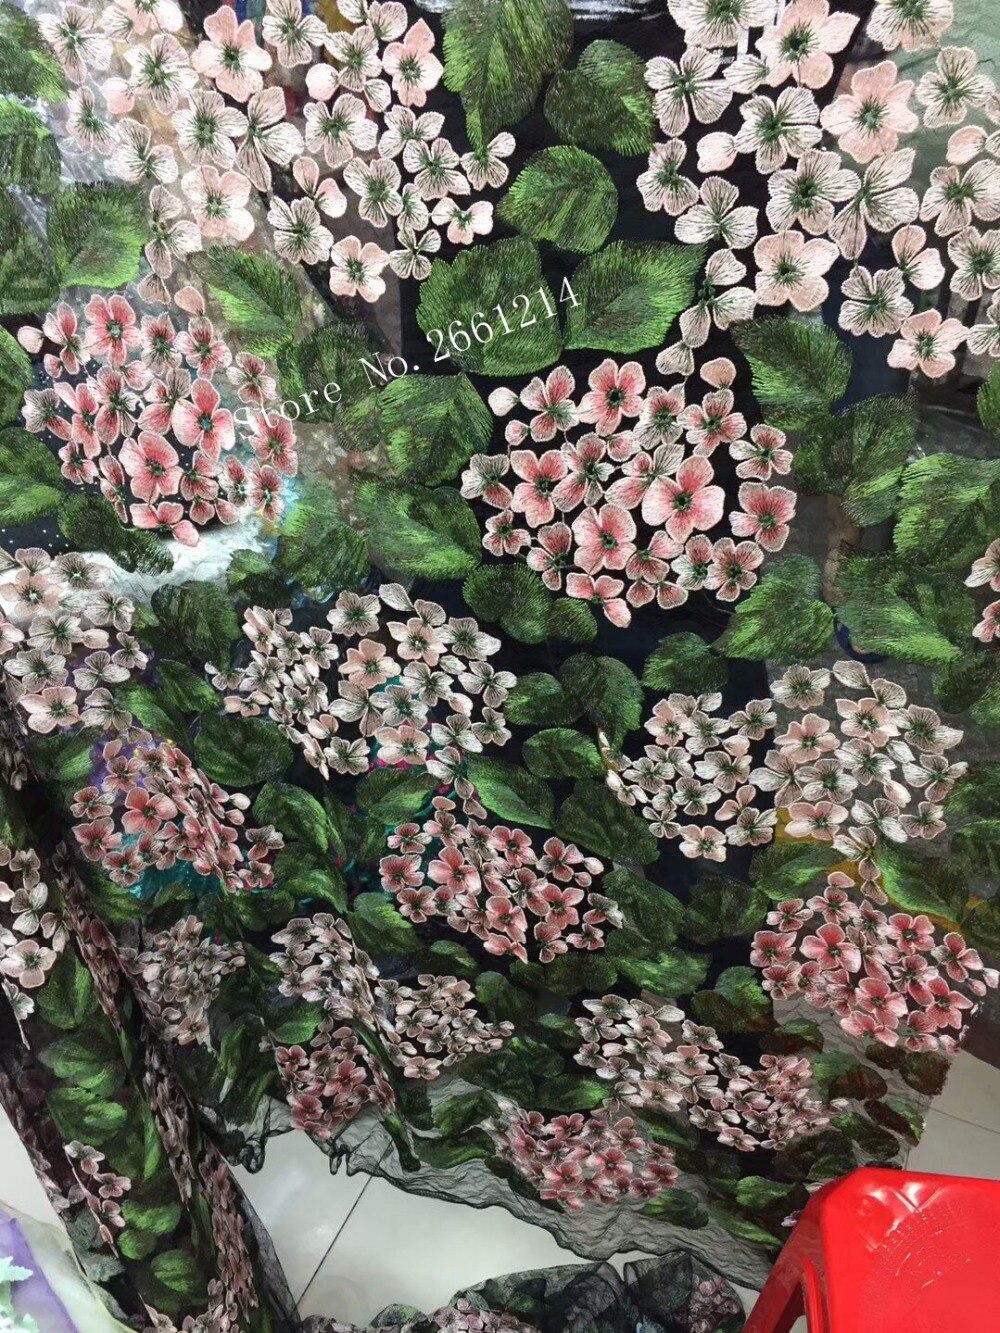 Alta clase flor 3d BZL-5407 tela de encaje de tul africano en venta tela de encaje de red de tul de malla africana con flores 3d